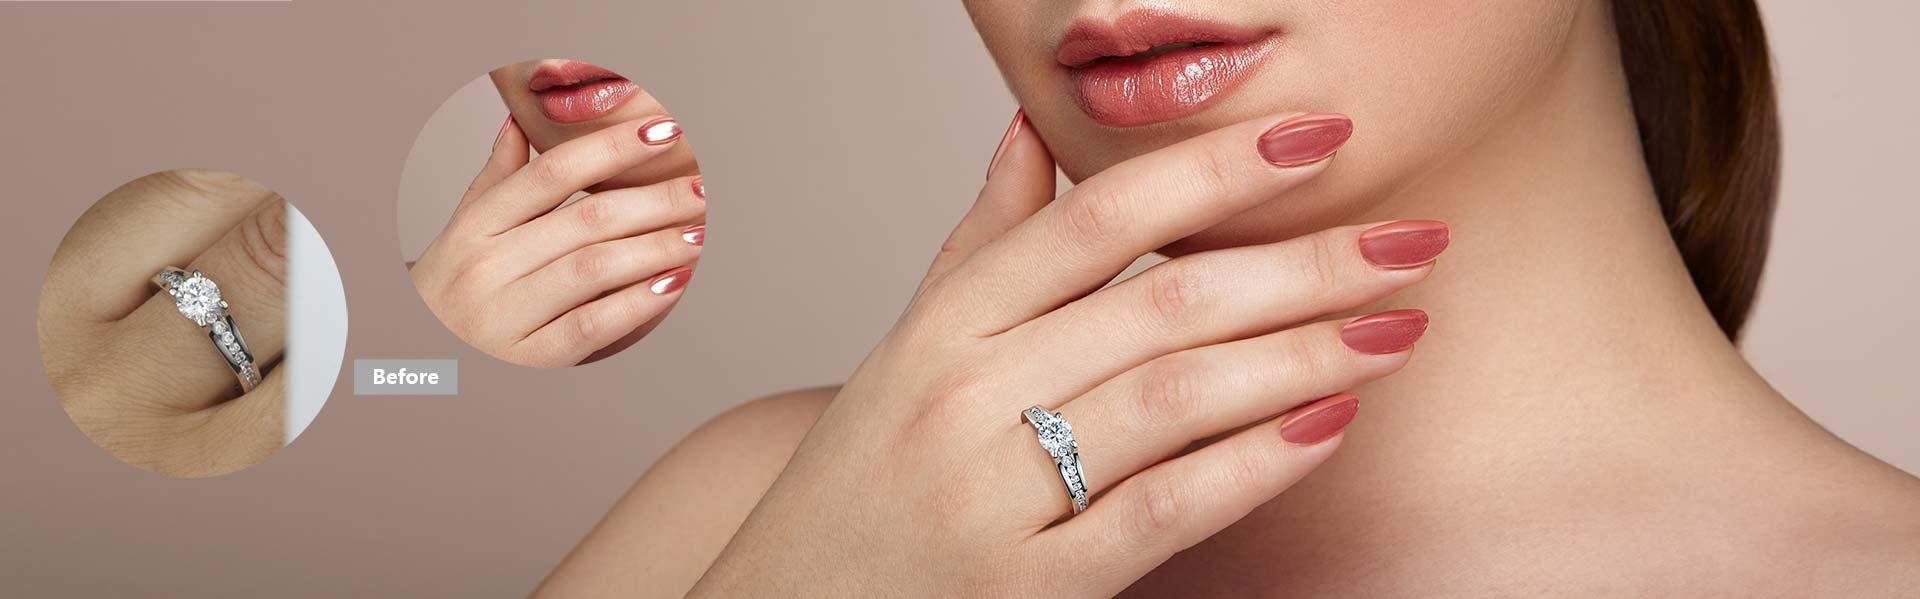 jewelry retouching service,merge ring to model hand